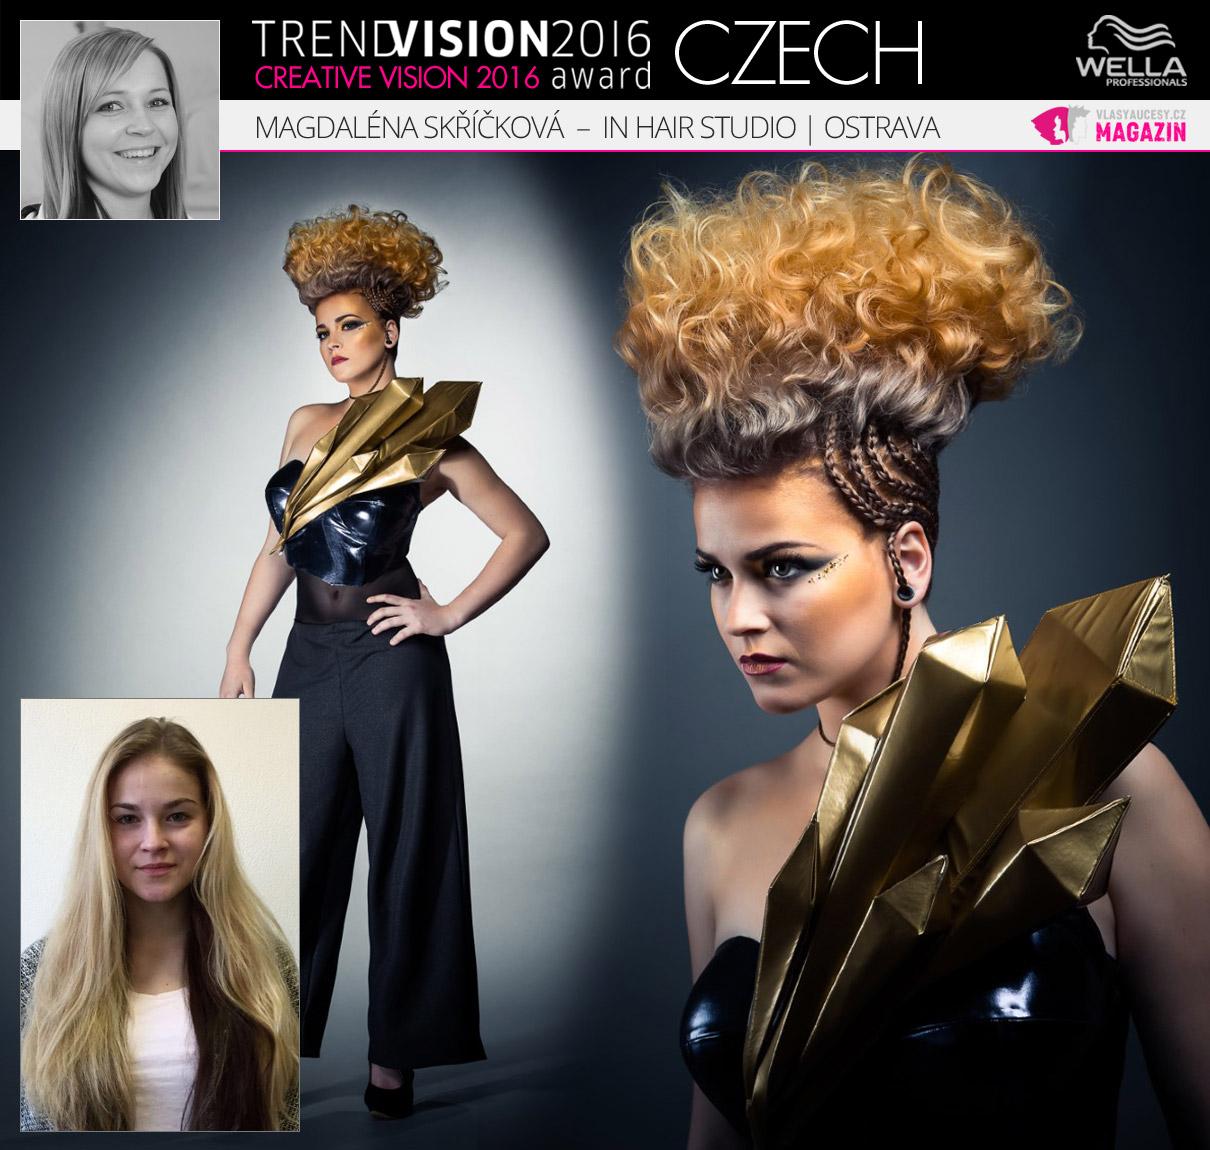 Magdaléna Skříčková, In Hair Studio, Ostrava –Wella Professionals Trend Vision Award Česká republika, kategorie Creative Vision 2016.